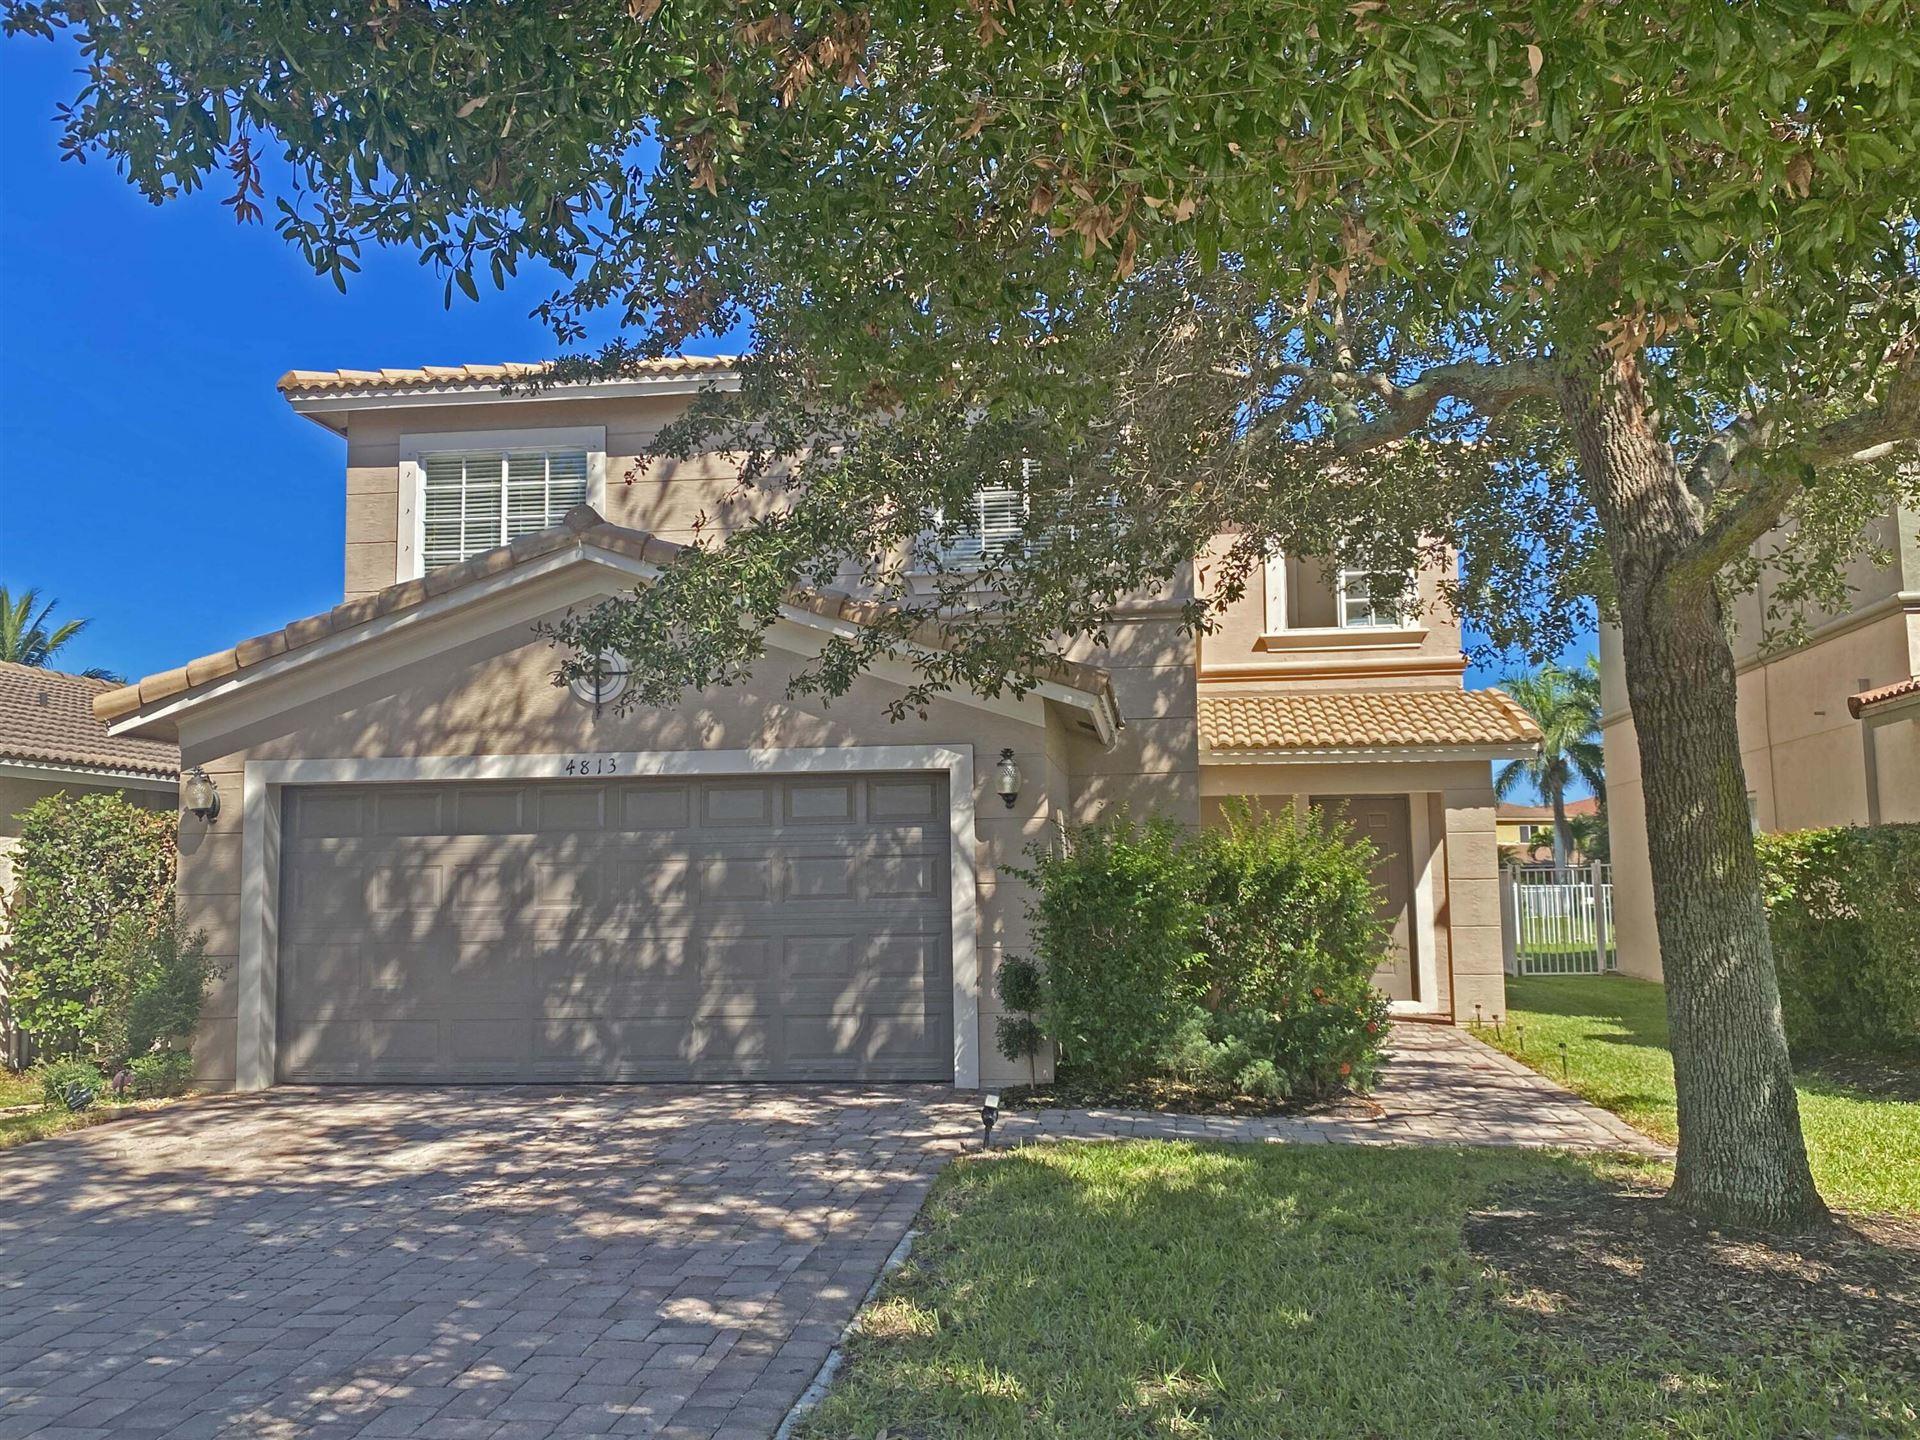 Photo of 4813 SE Graham Drive, Stuart, FL 34996 (MLS # RX-10753657)